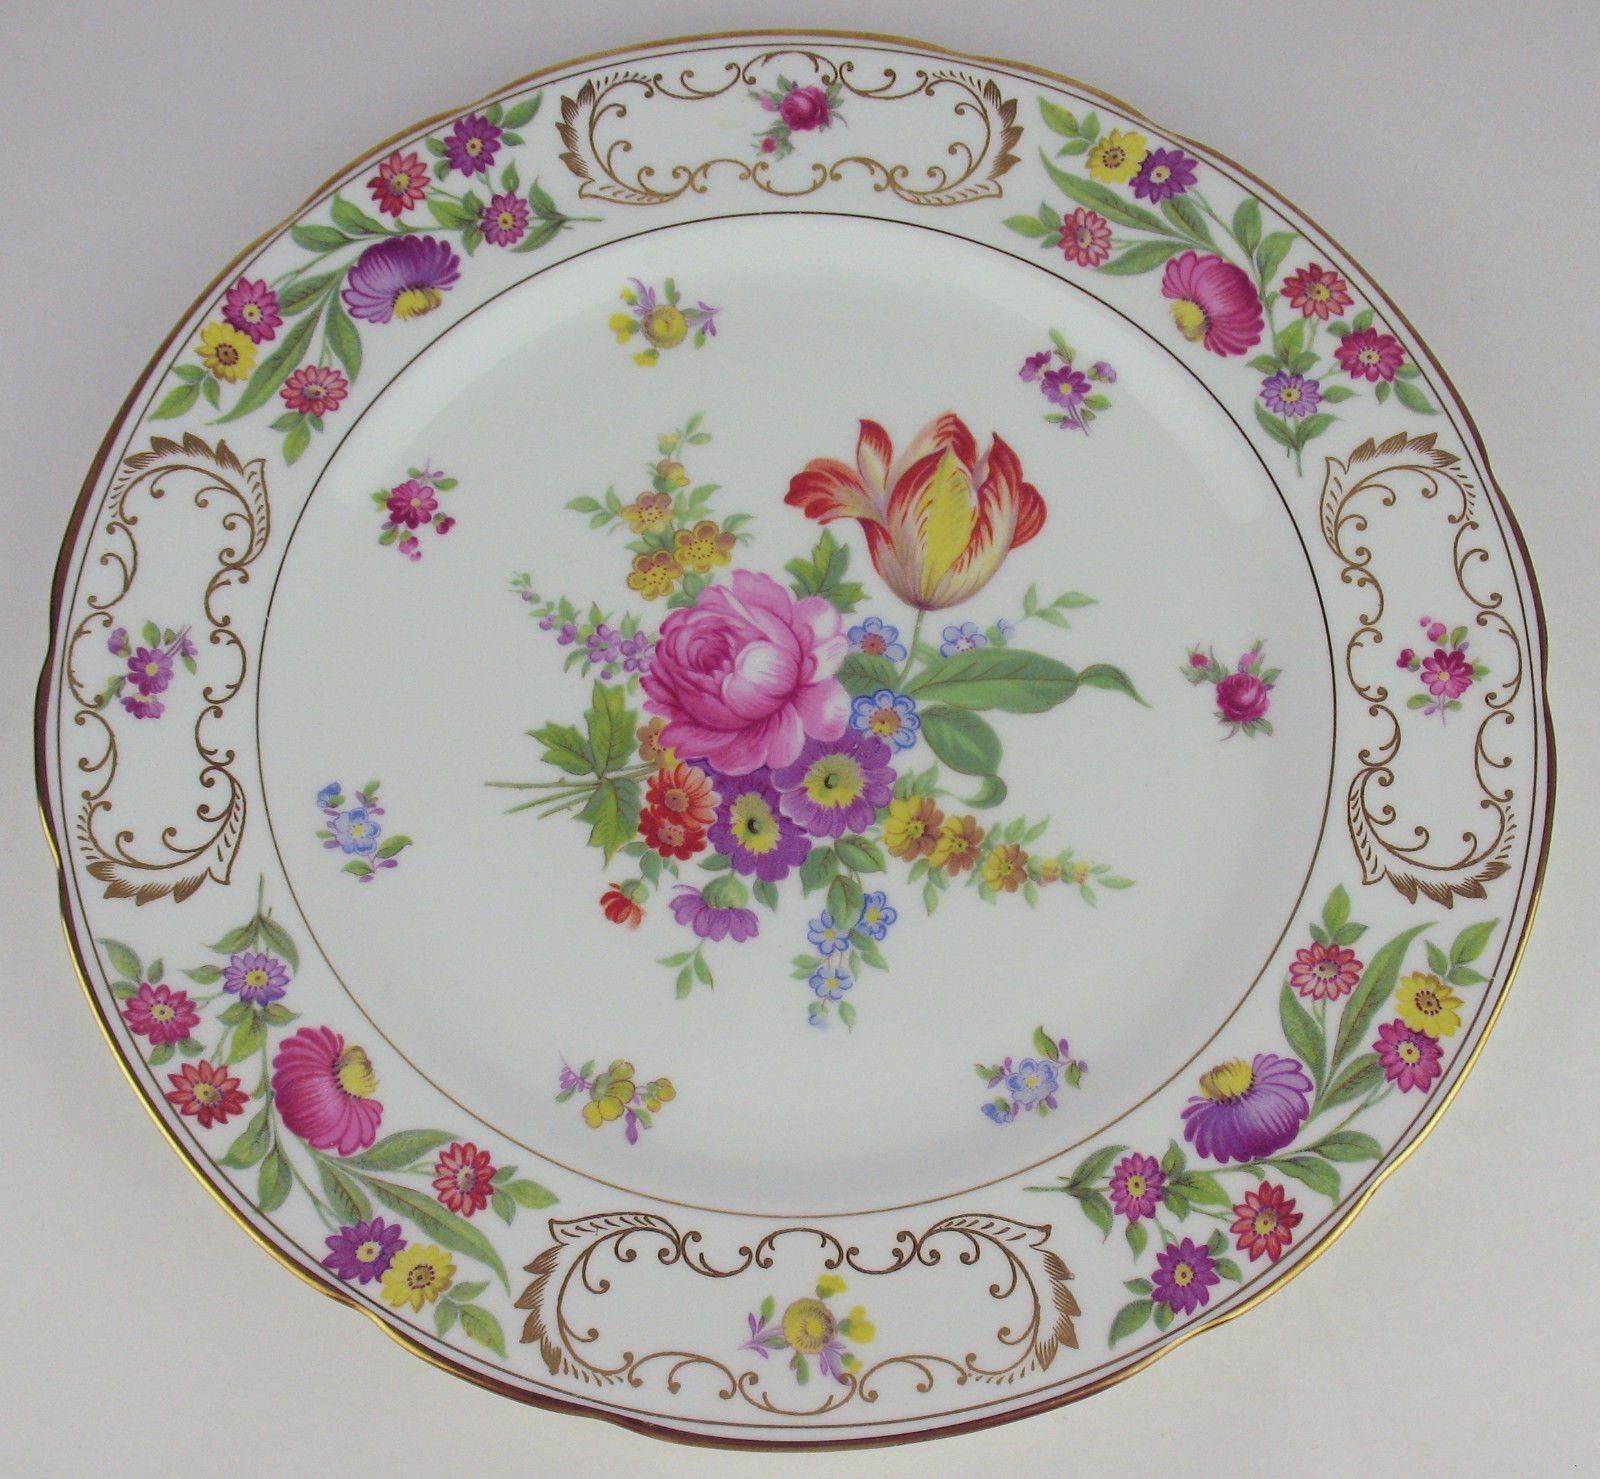 4 x Dinner Plates 10 1 2\  Hammersley Dresden Sprays Vintage Bone China England | & 4 x Dinner Plates 10 1 2\